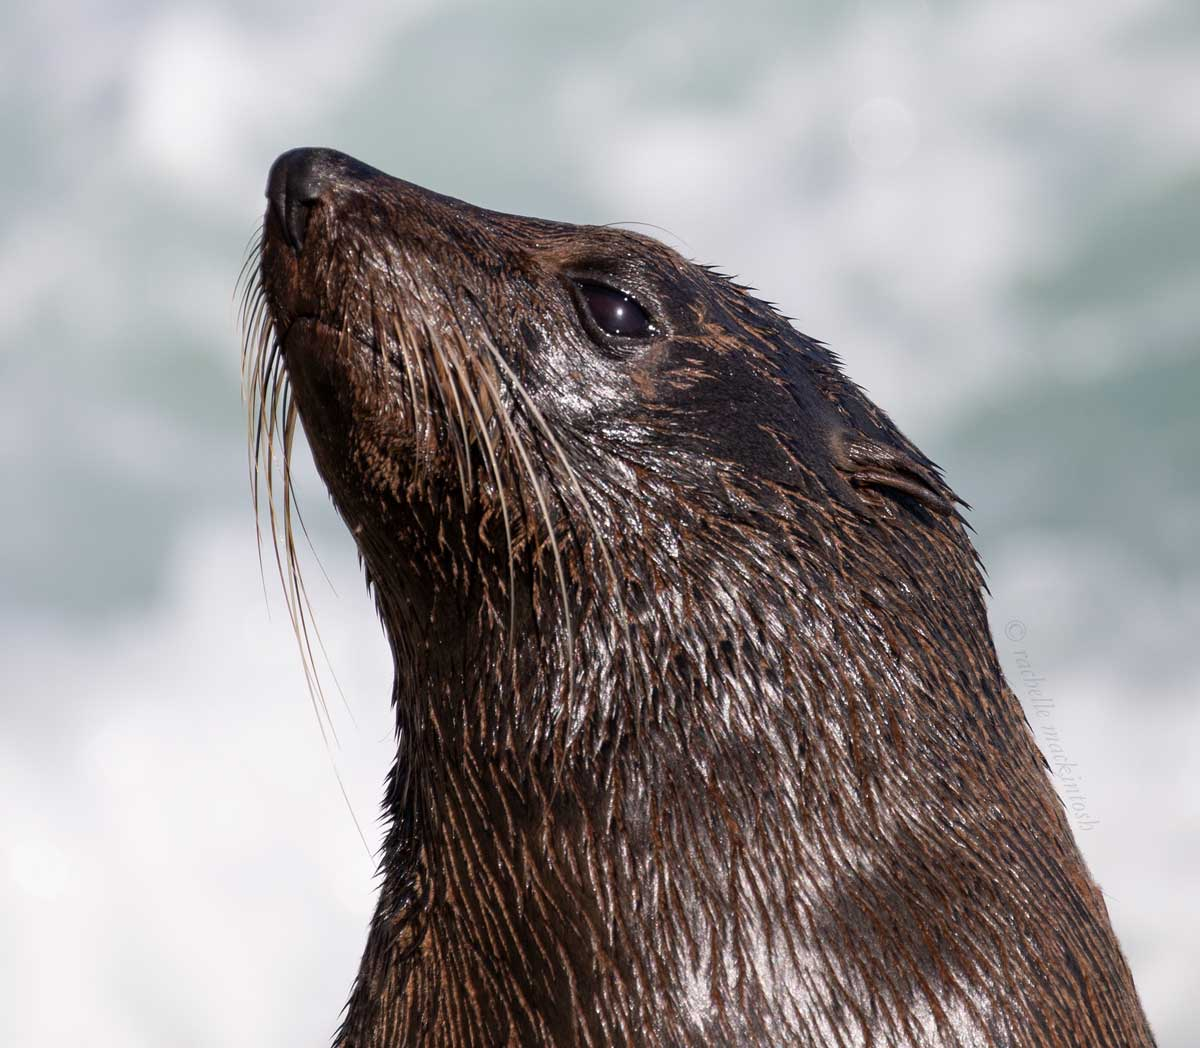 narooma seal sealion new south wales australia